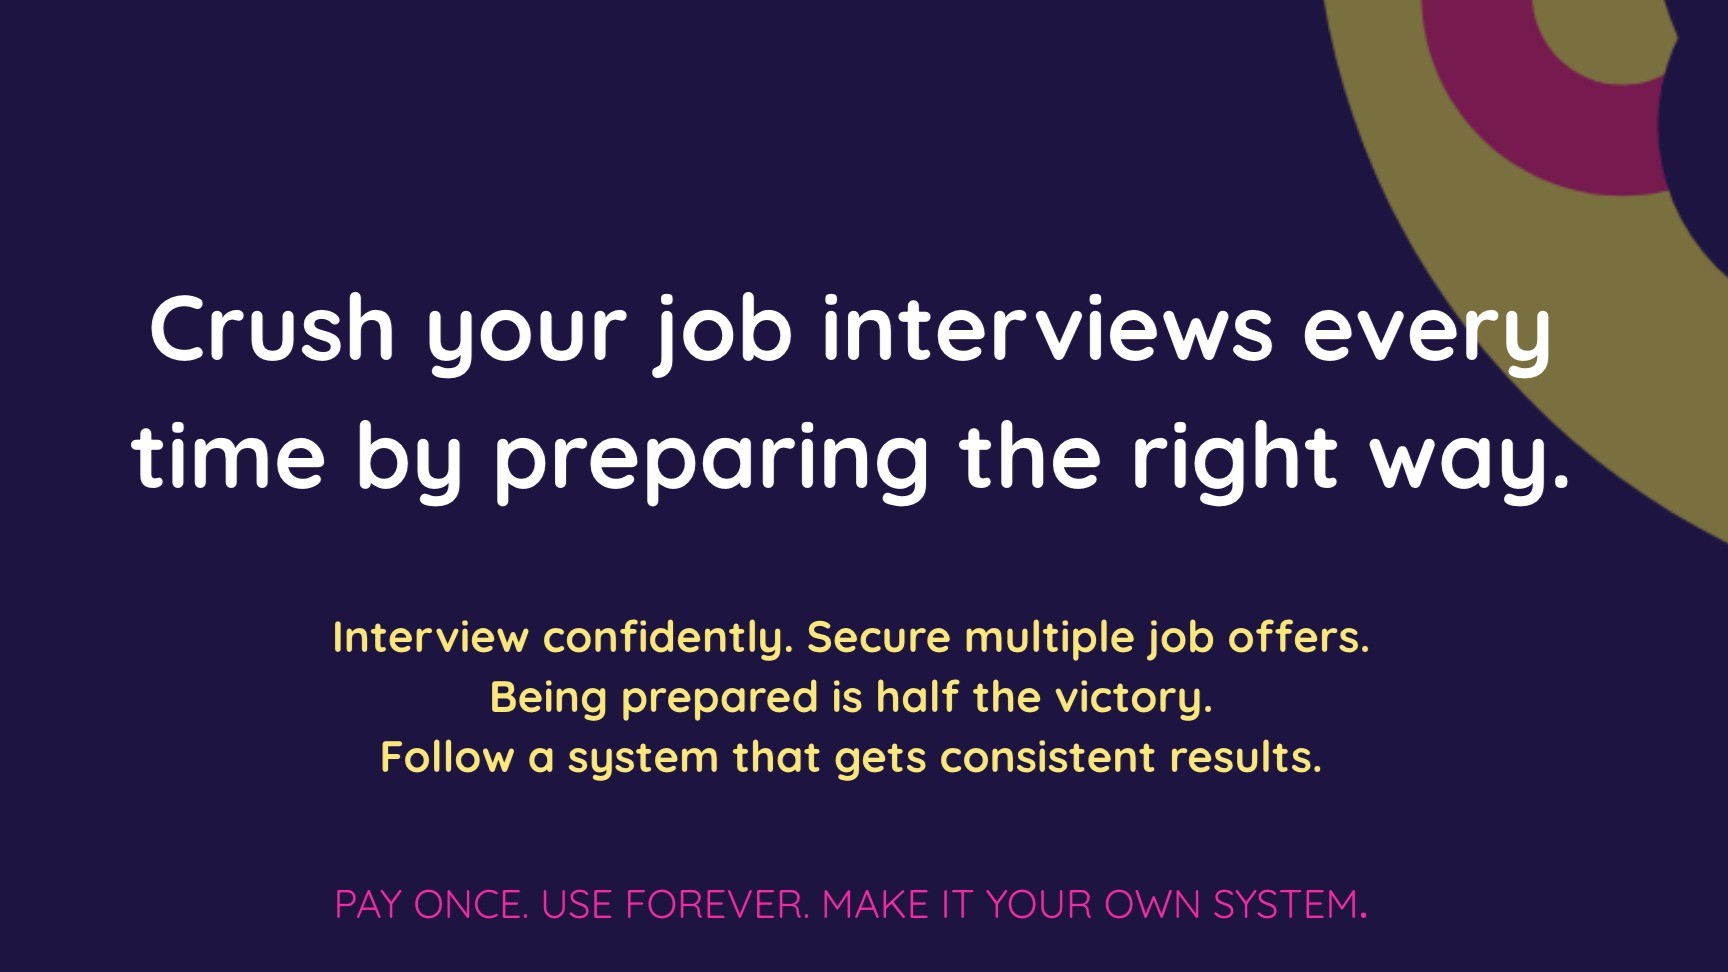 AppSumo Deal for Marketing Job Interview Prep Crash Course